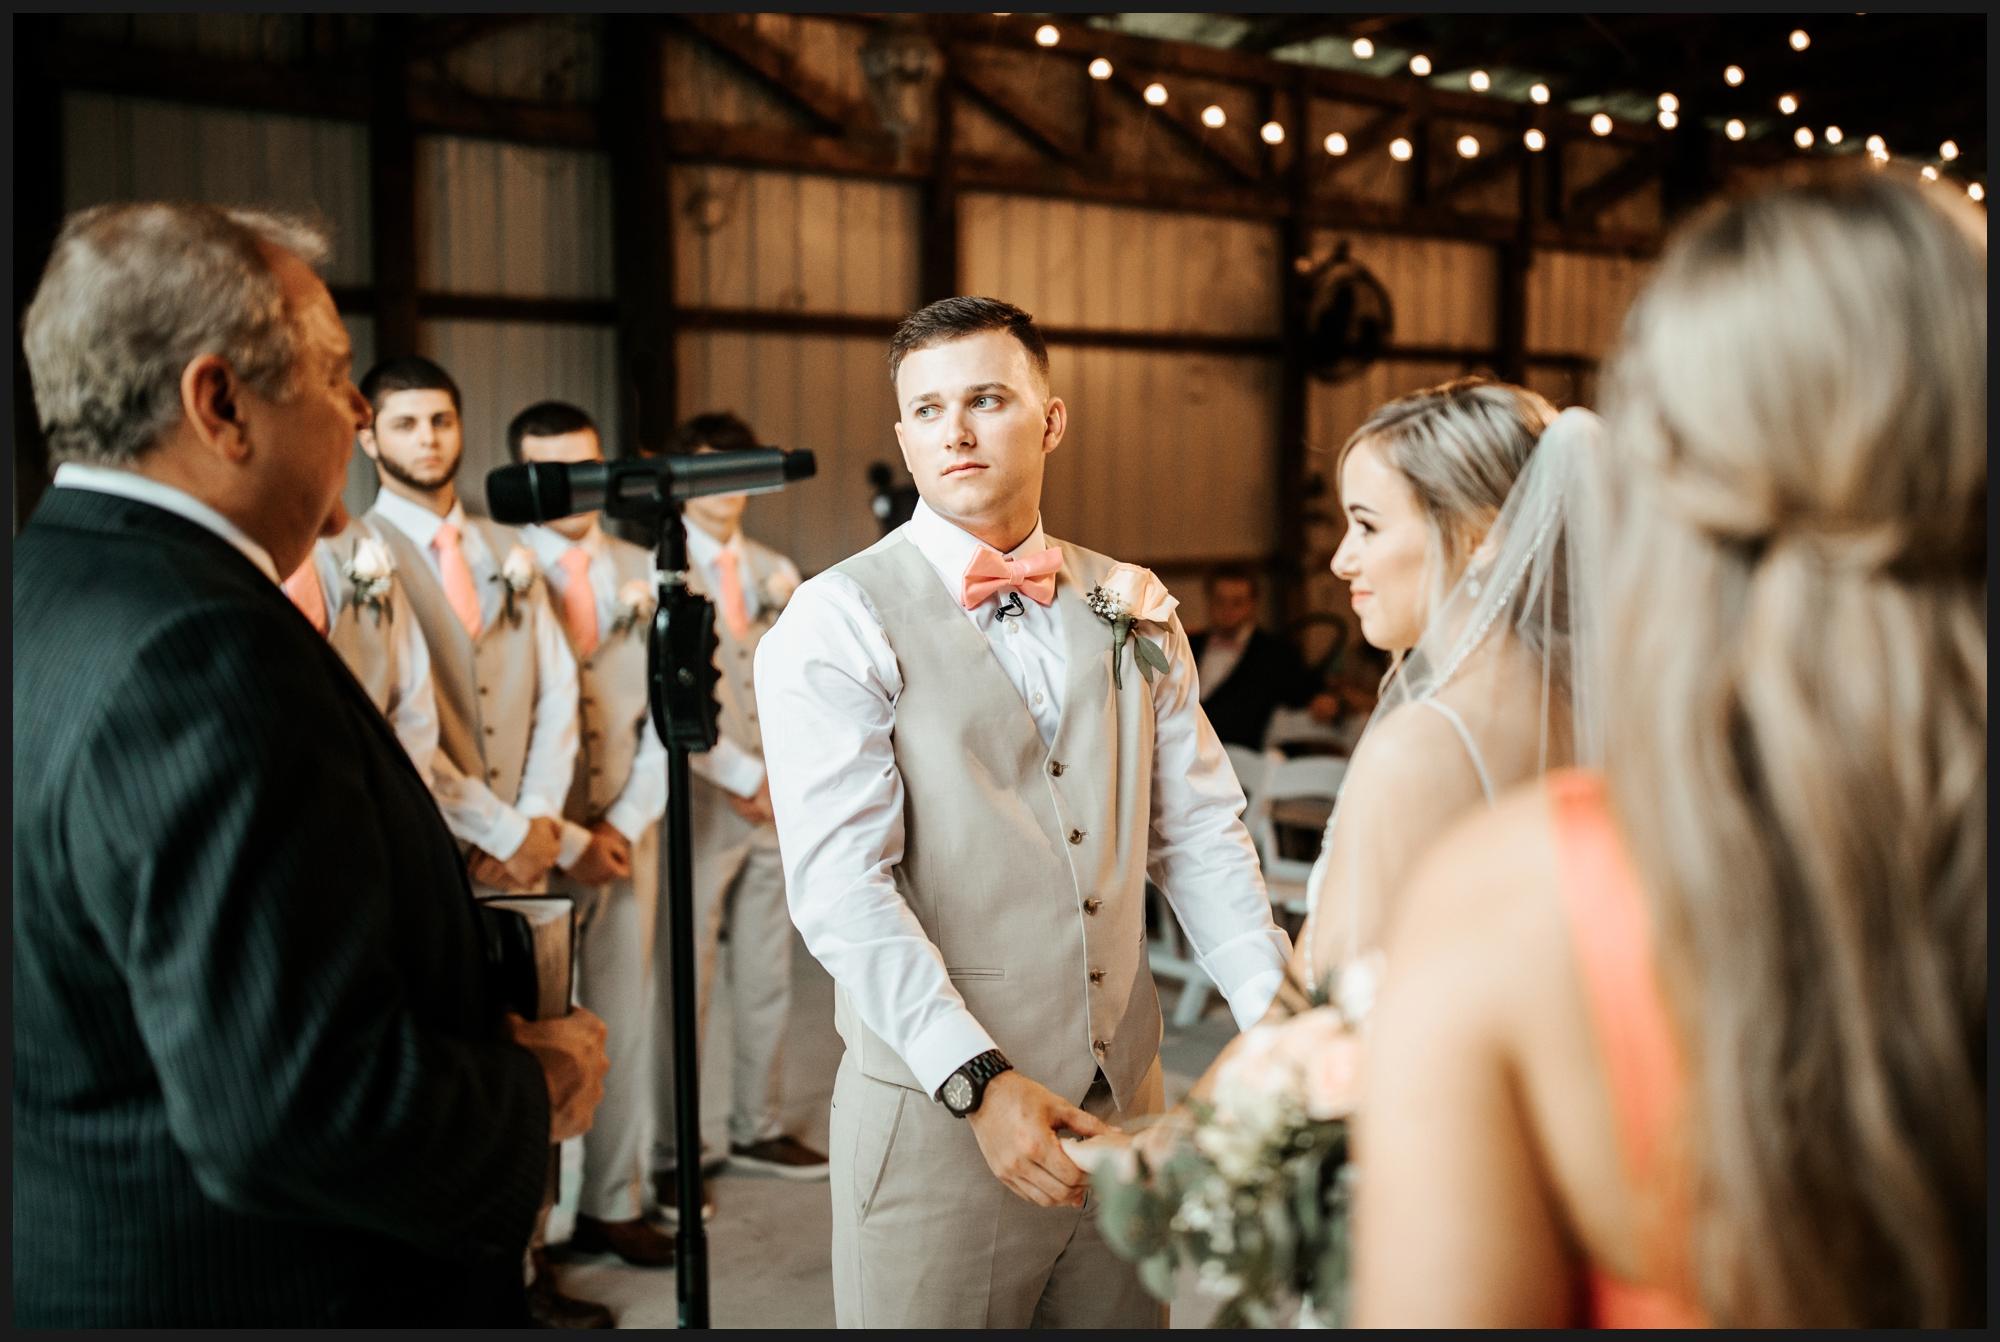 Orlando-Wedding-Photographer-destination-wedding-photographer-florida-wedding-photographer-hawaii-wedding-photographer_0307.jpg